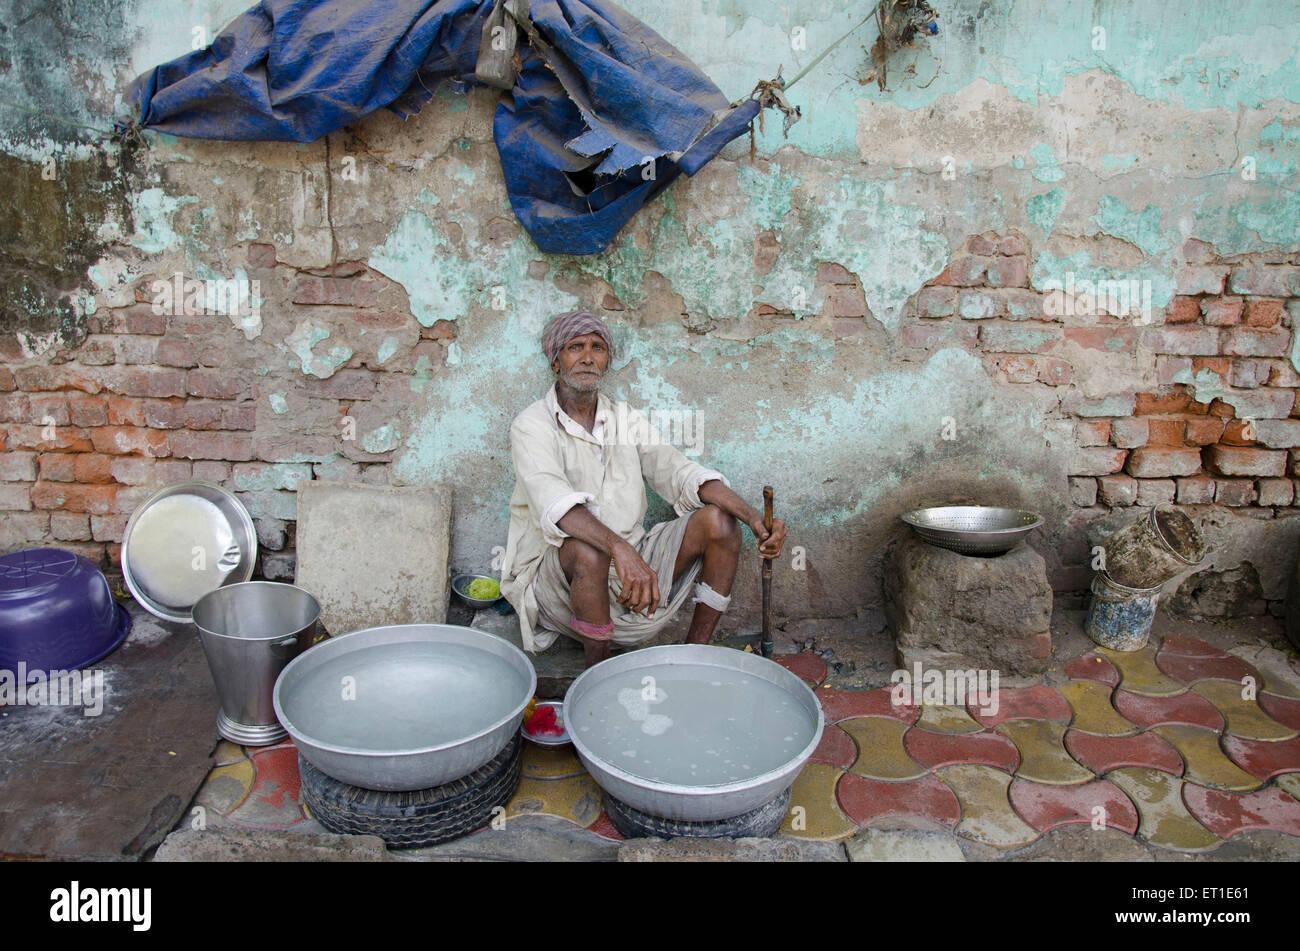 man cleansed utensils Ahmedabad Gujarat India Asia - Stock Image